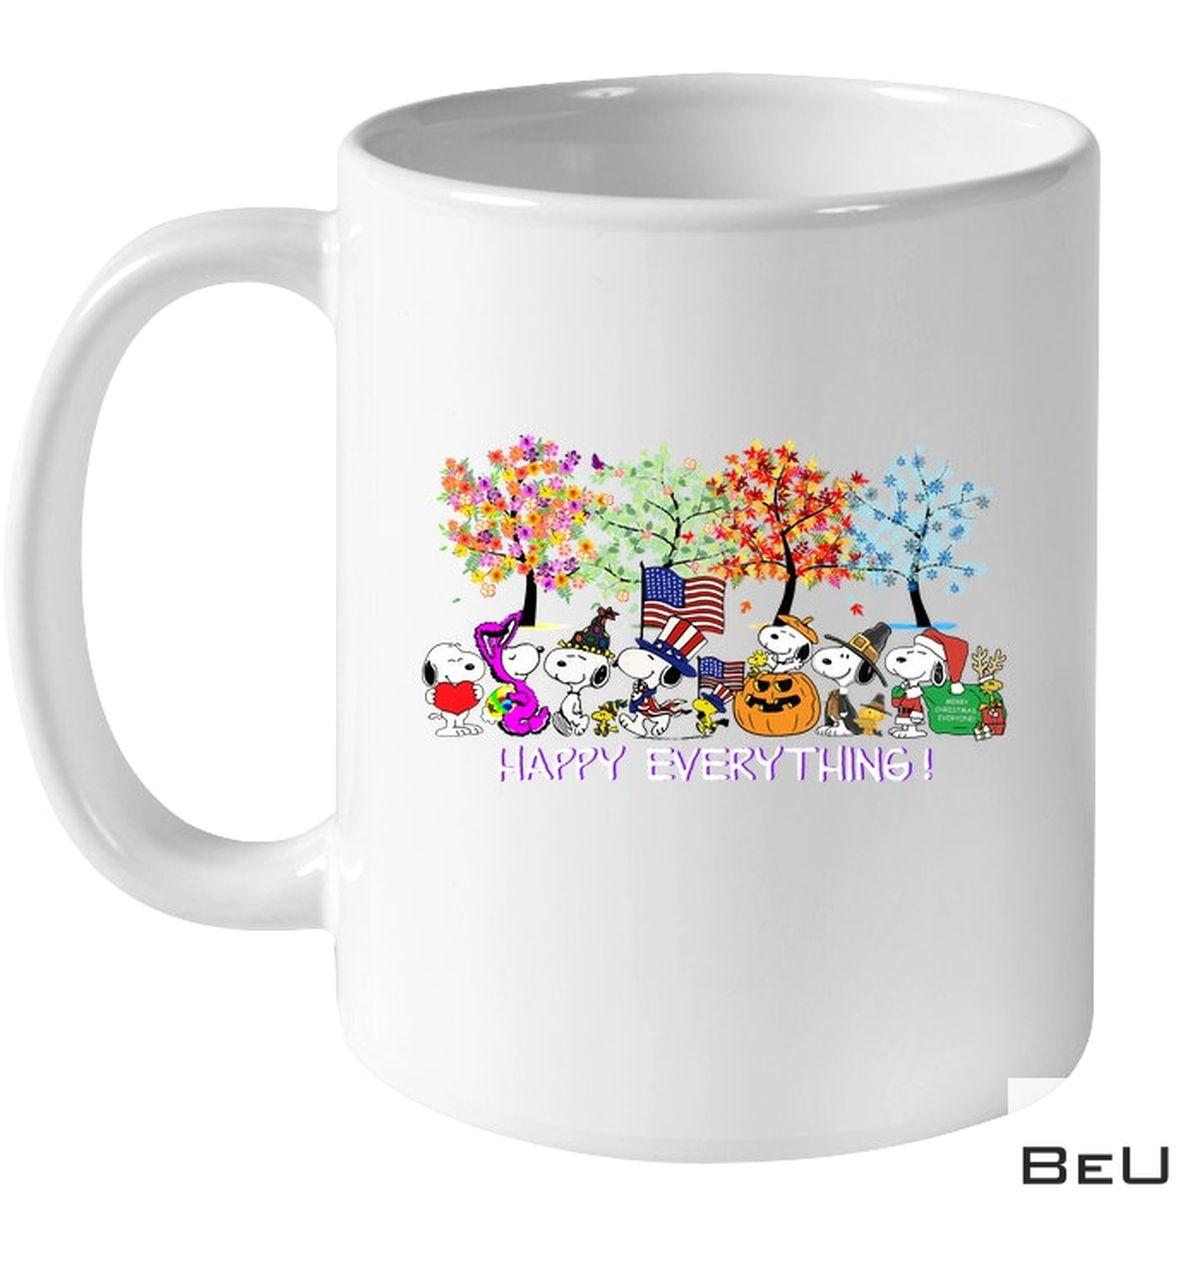 Snoopy Happy Everything Holiday Mug